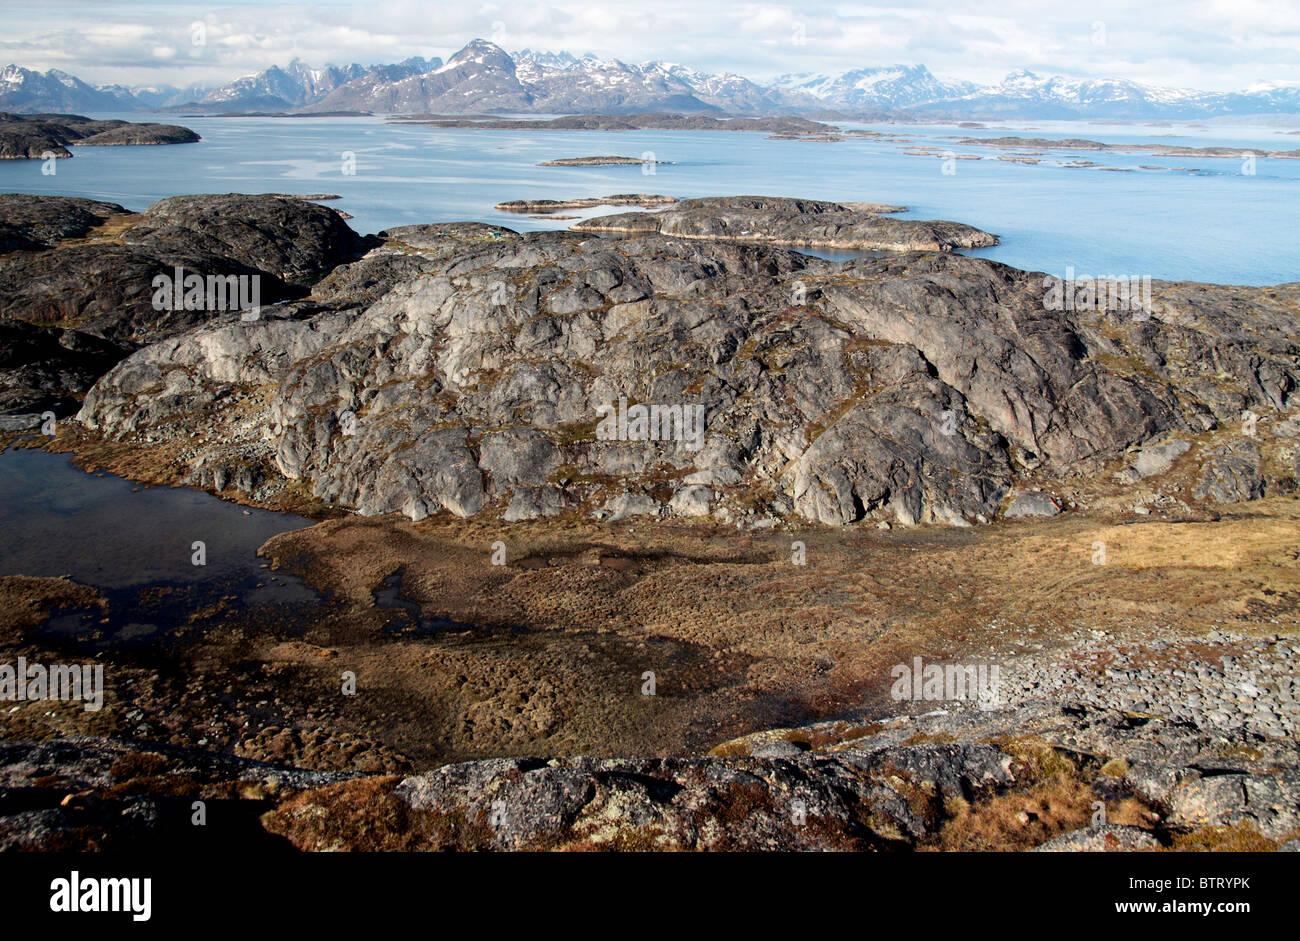 Fjord at Greenlandic coast - Stock Image